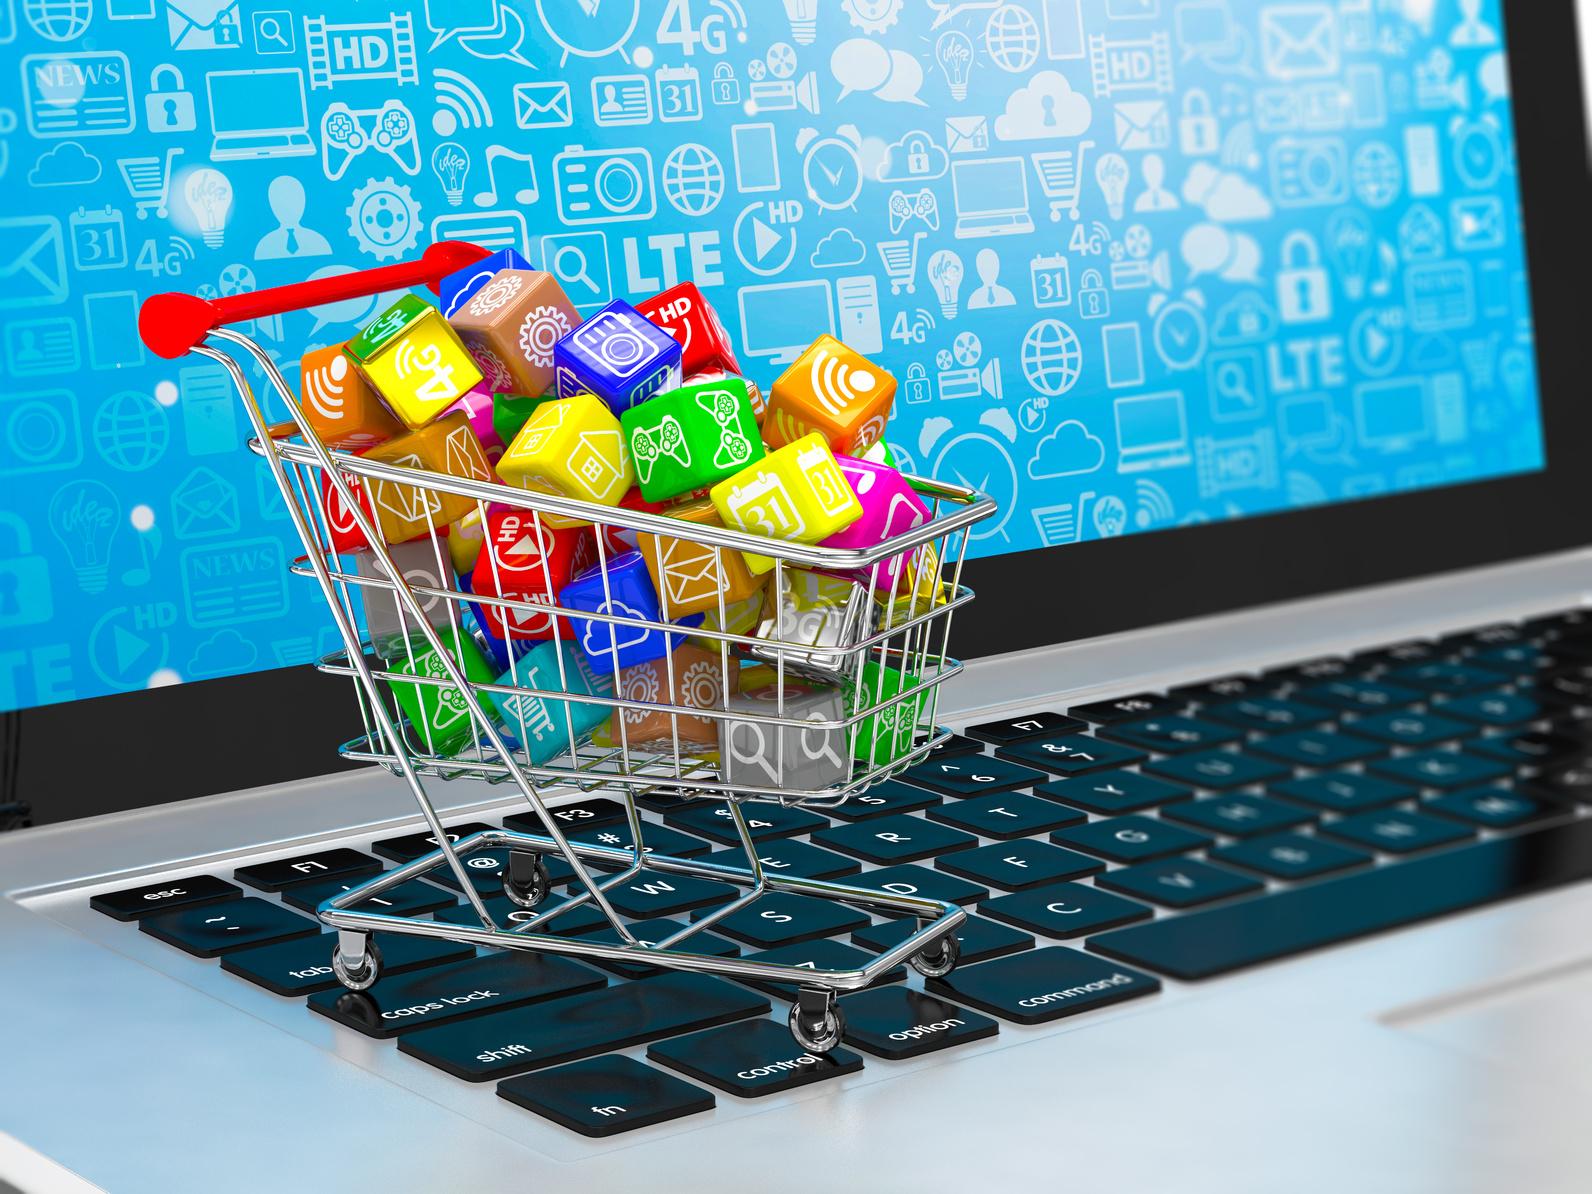 Vender na internet